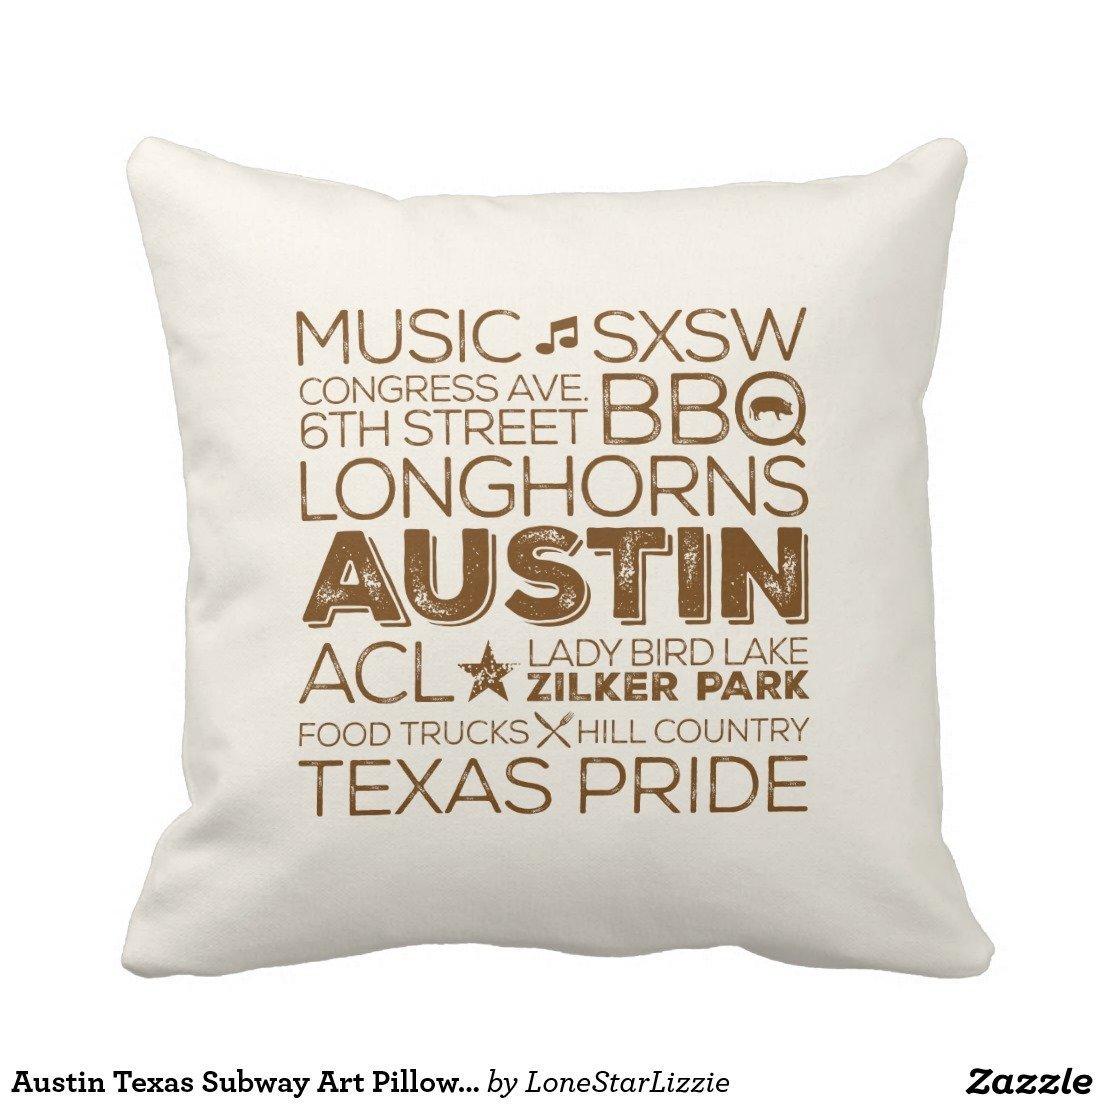 ArtoutletMF austin texas subway art pillow brown bluesky5051 18 X 18 inch